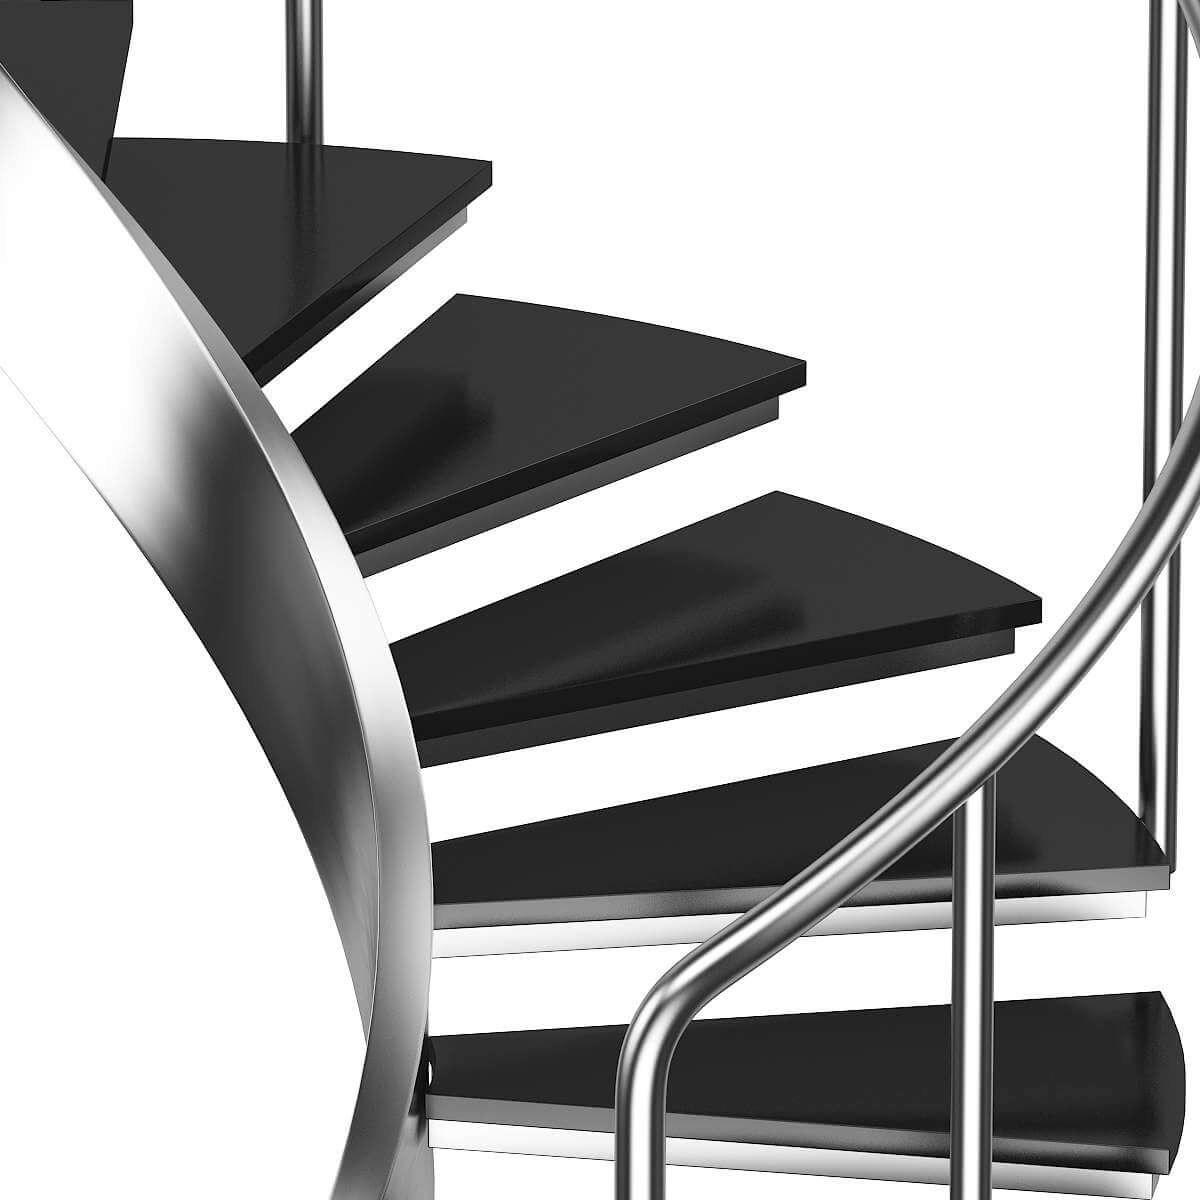 Black Metal Spiral Stairs 3D Model   Black Metal Spiral Staircase   Spiral Stairs   Cat Spiral   Arke   Abandoned   Circle Metal